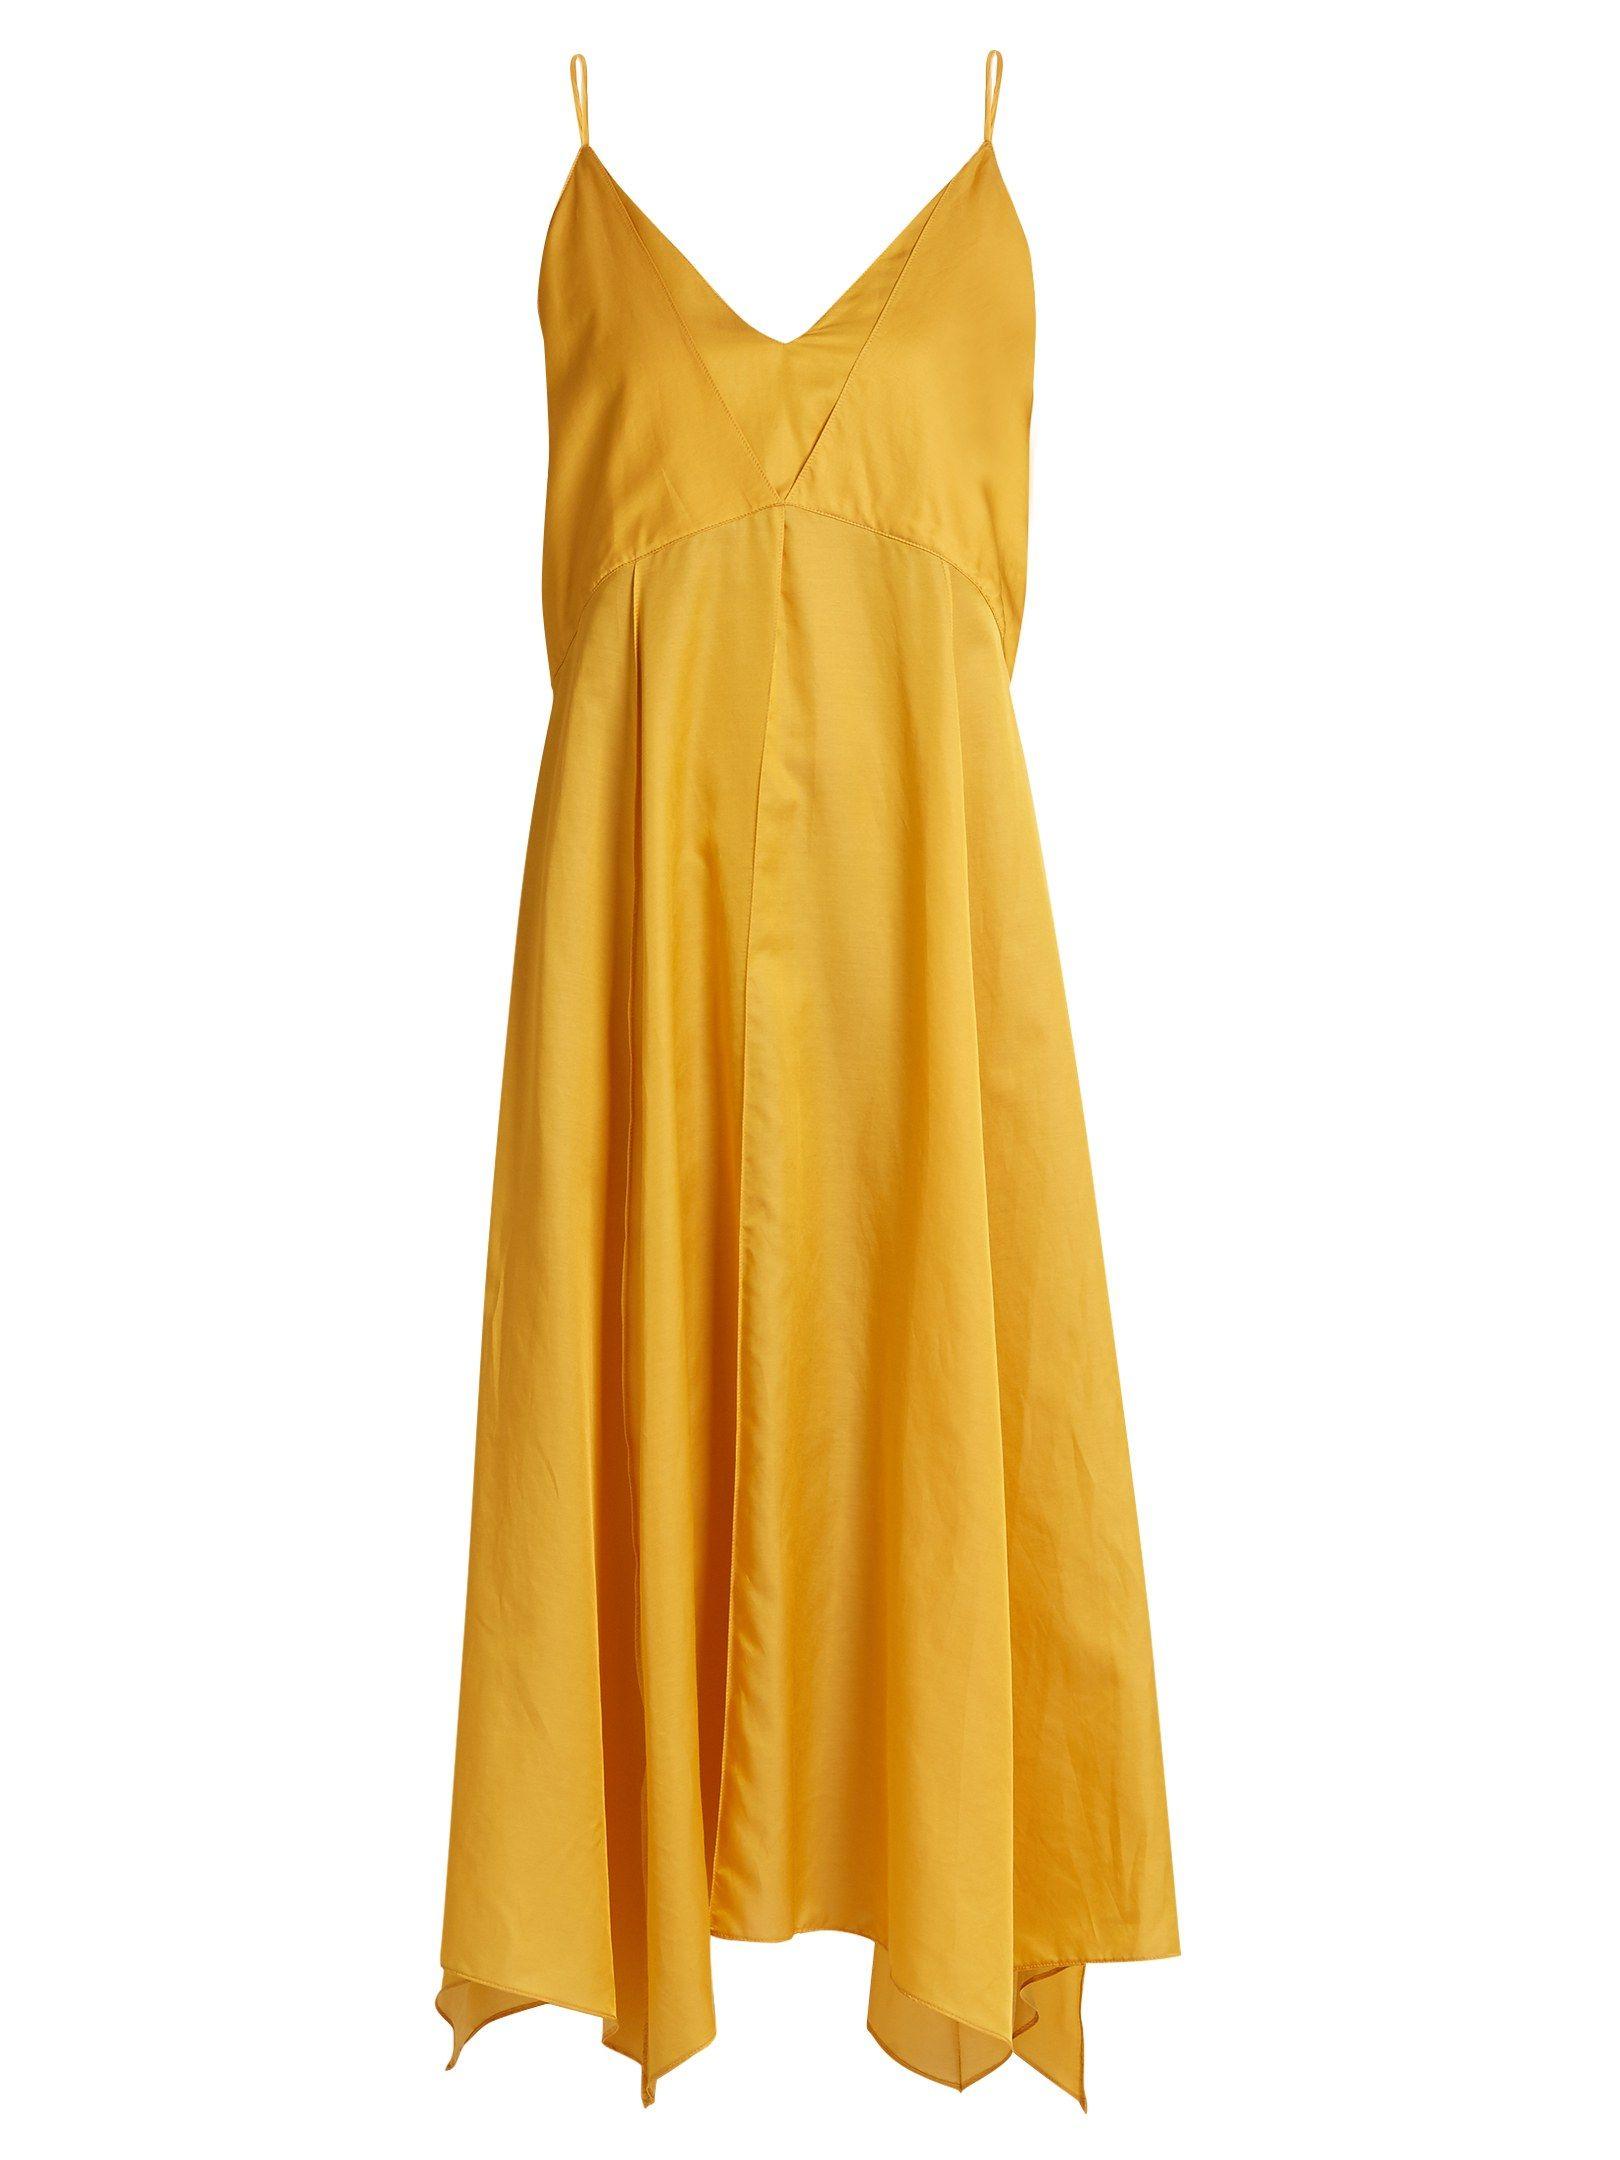 Yellow bridesmaidsu dresses from mustard to marigold brides